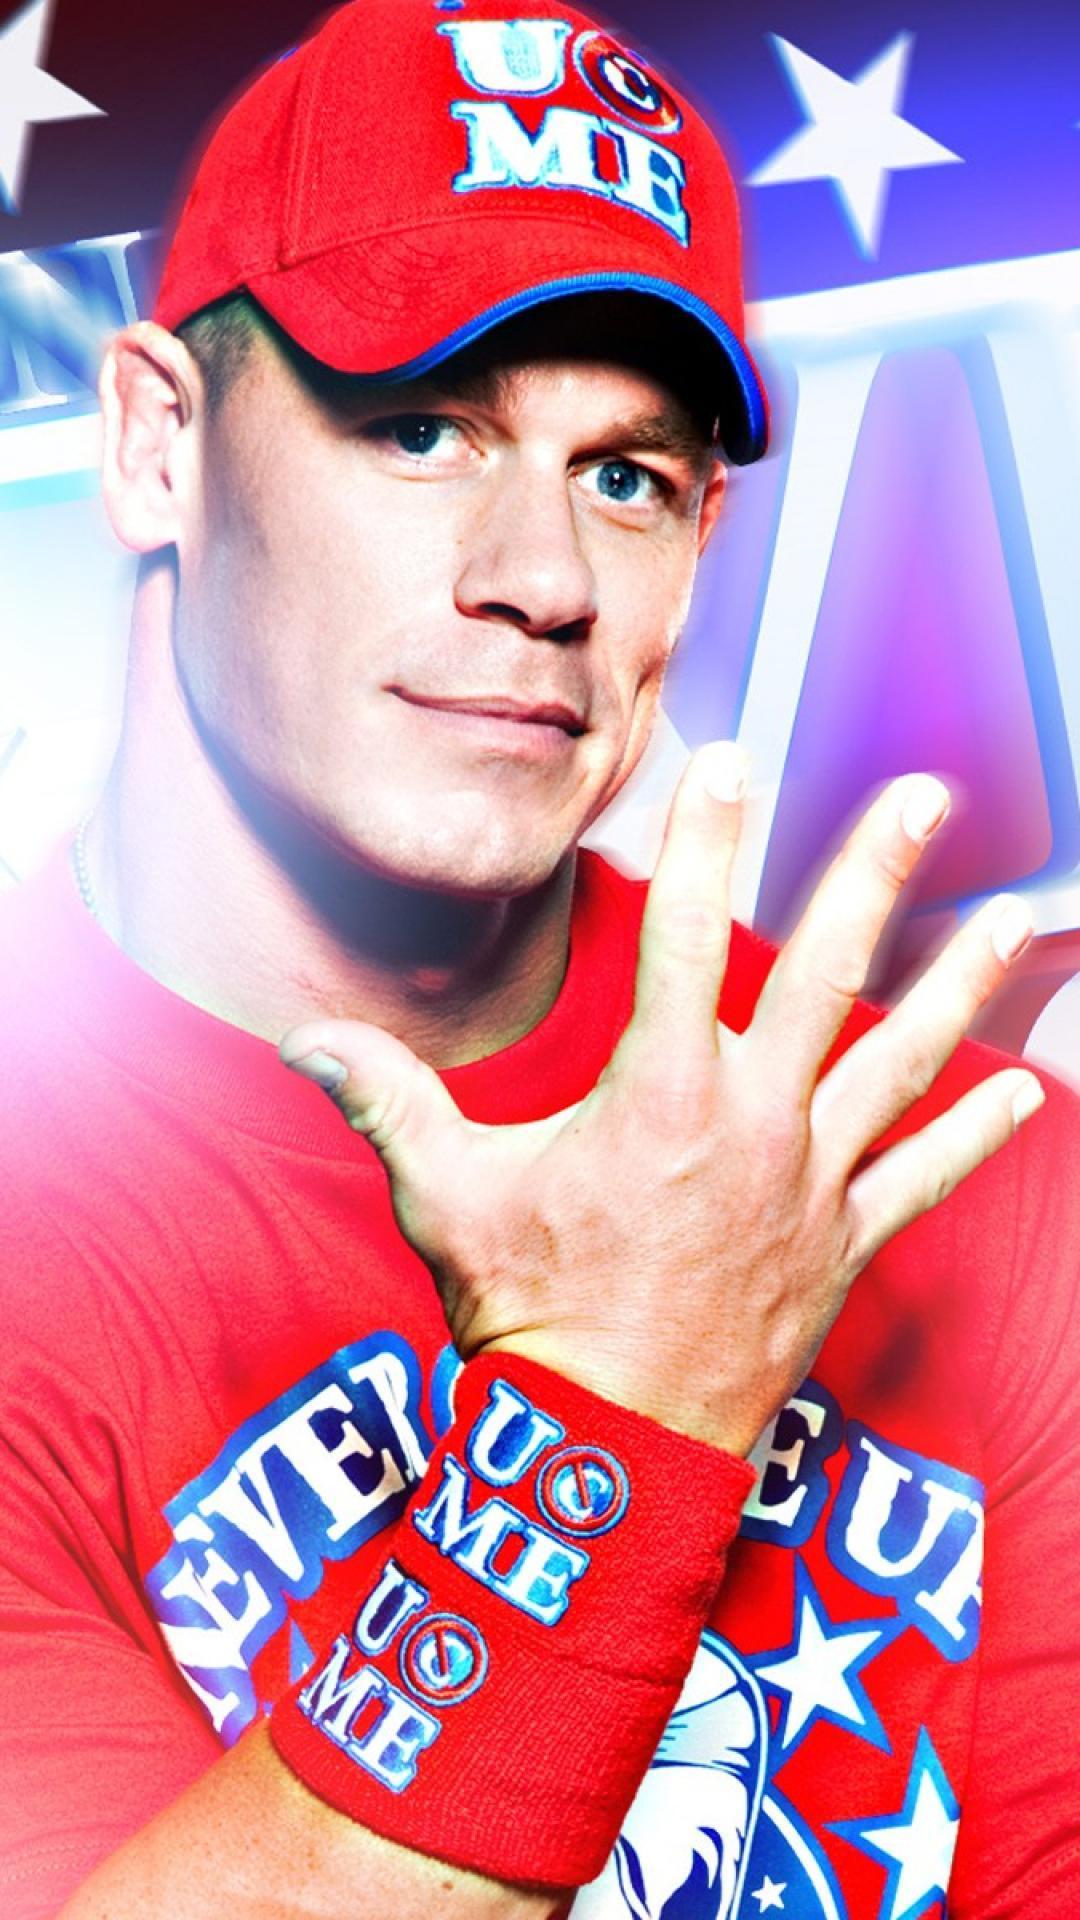 John Cena Hd Phone Wallpapers - Wallpaper Cave